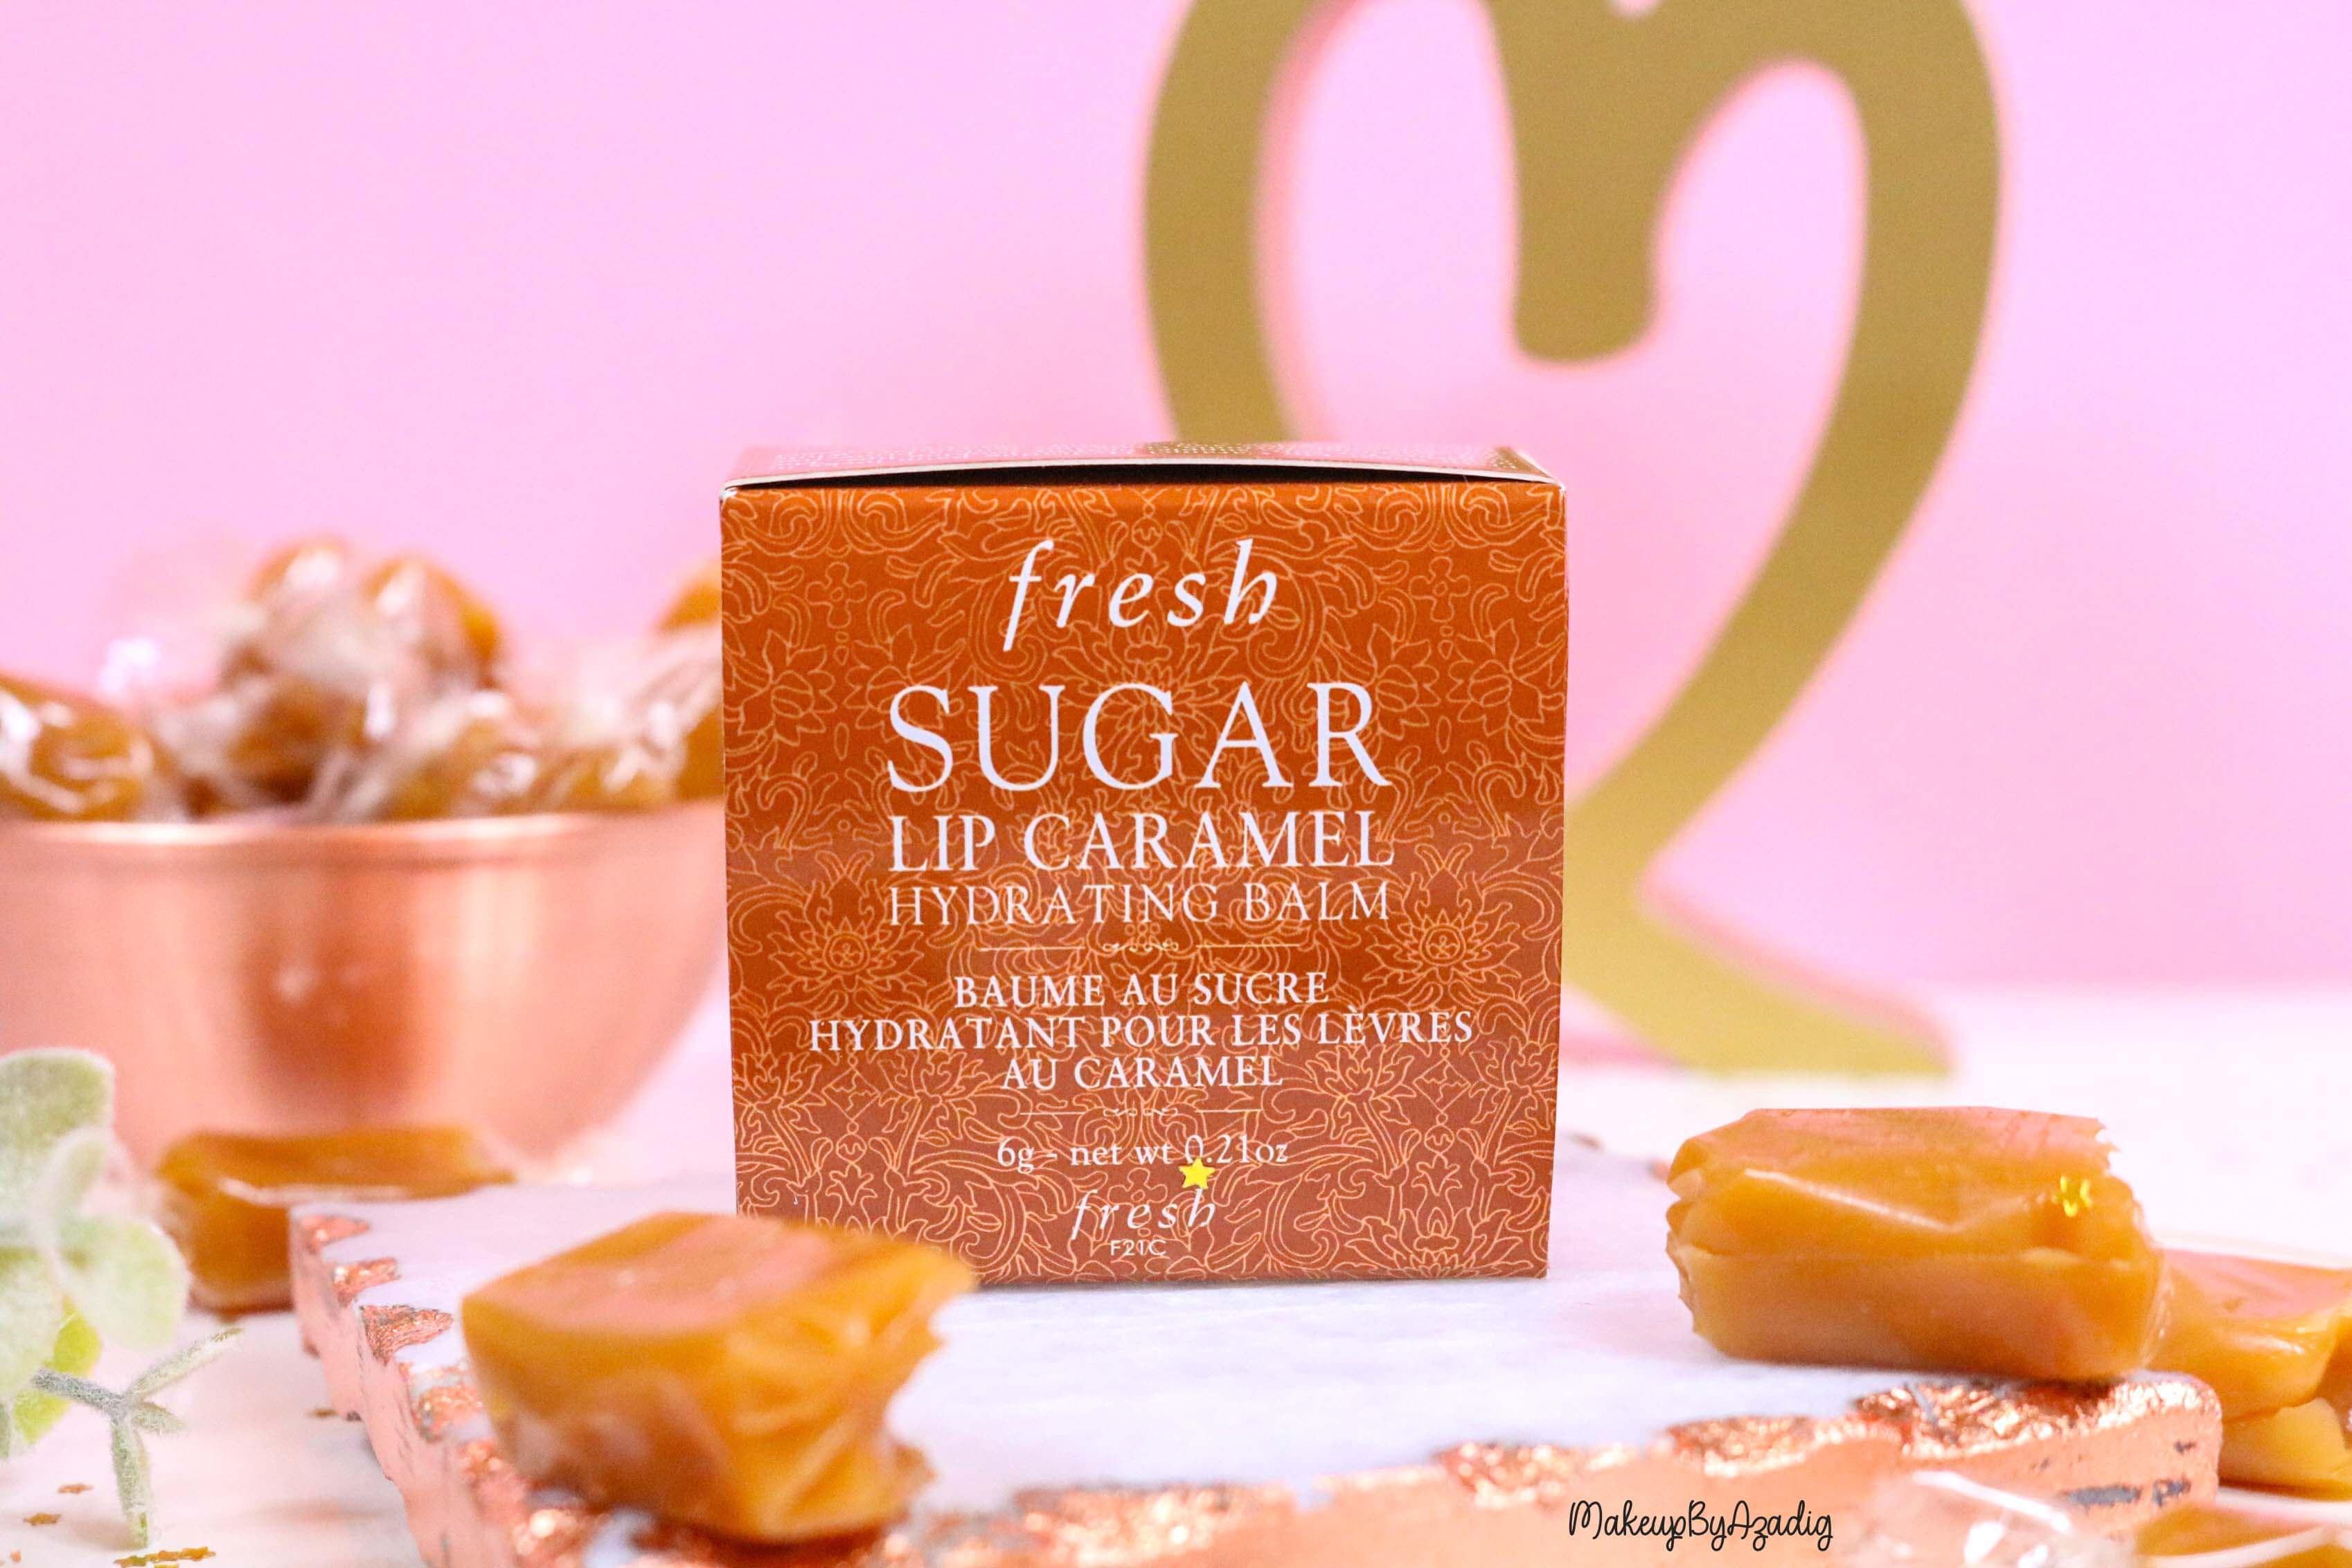 revue-baume-sucre-fresh-beauty-skincare-caramel-sugar-lip-caramel-sephora-makeupbyazadig-avis-prix-balm-packaging